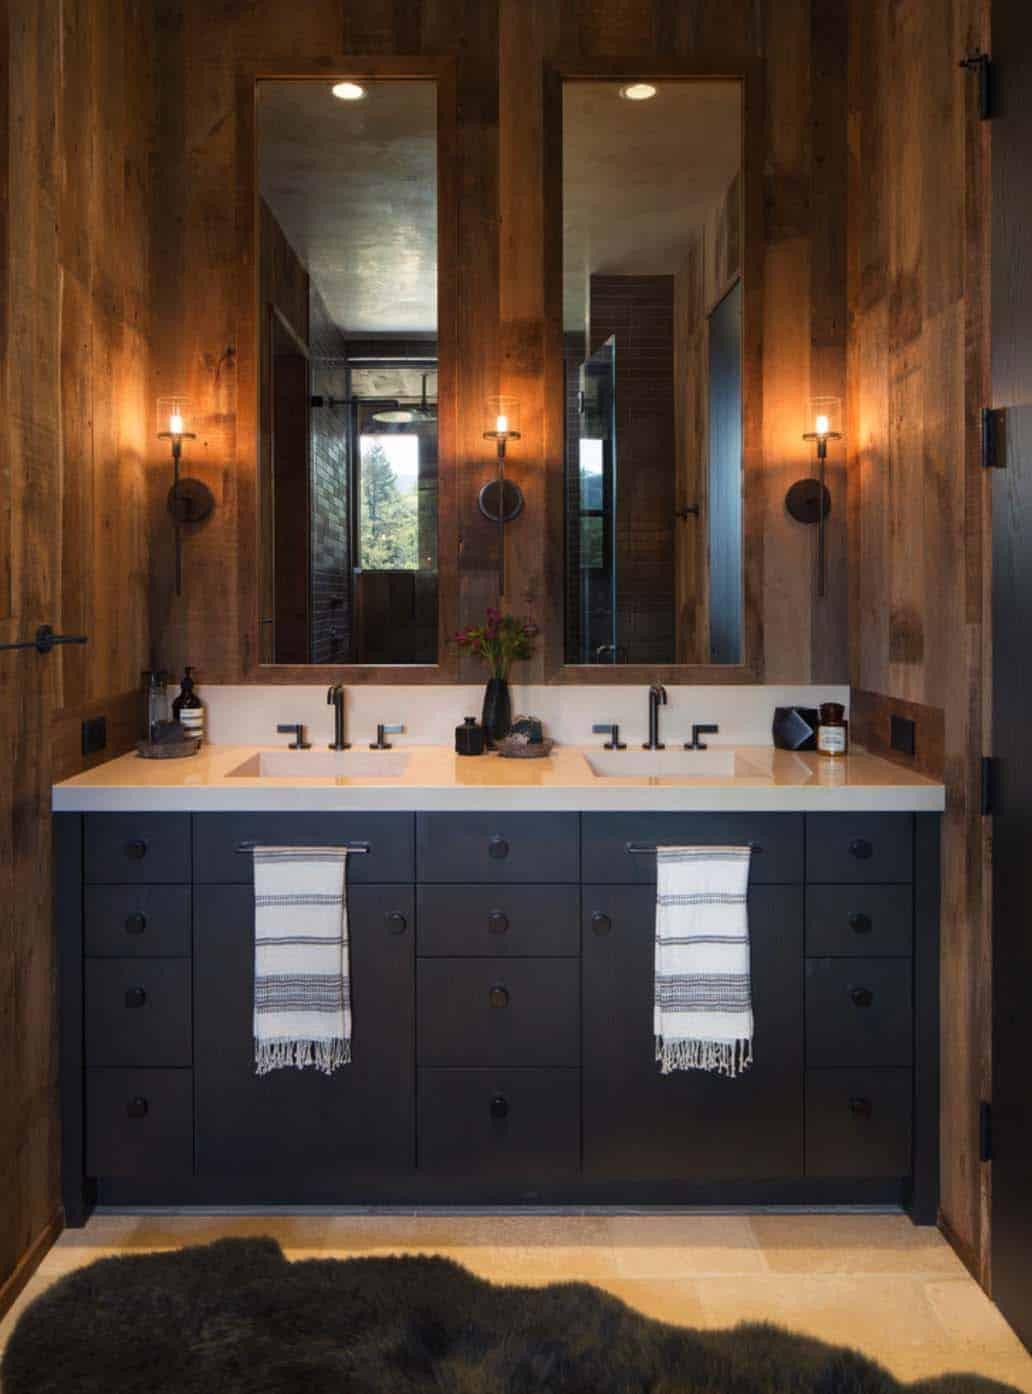 Maison de style ferme-Jennifer Robin Interiors-13-1 Kindesign